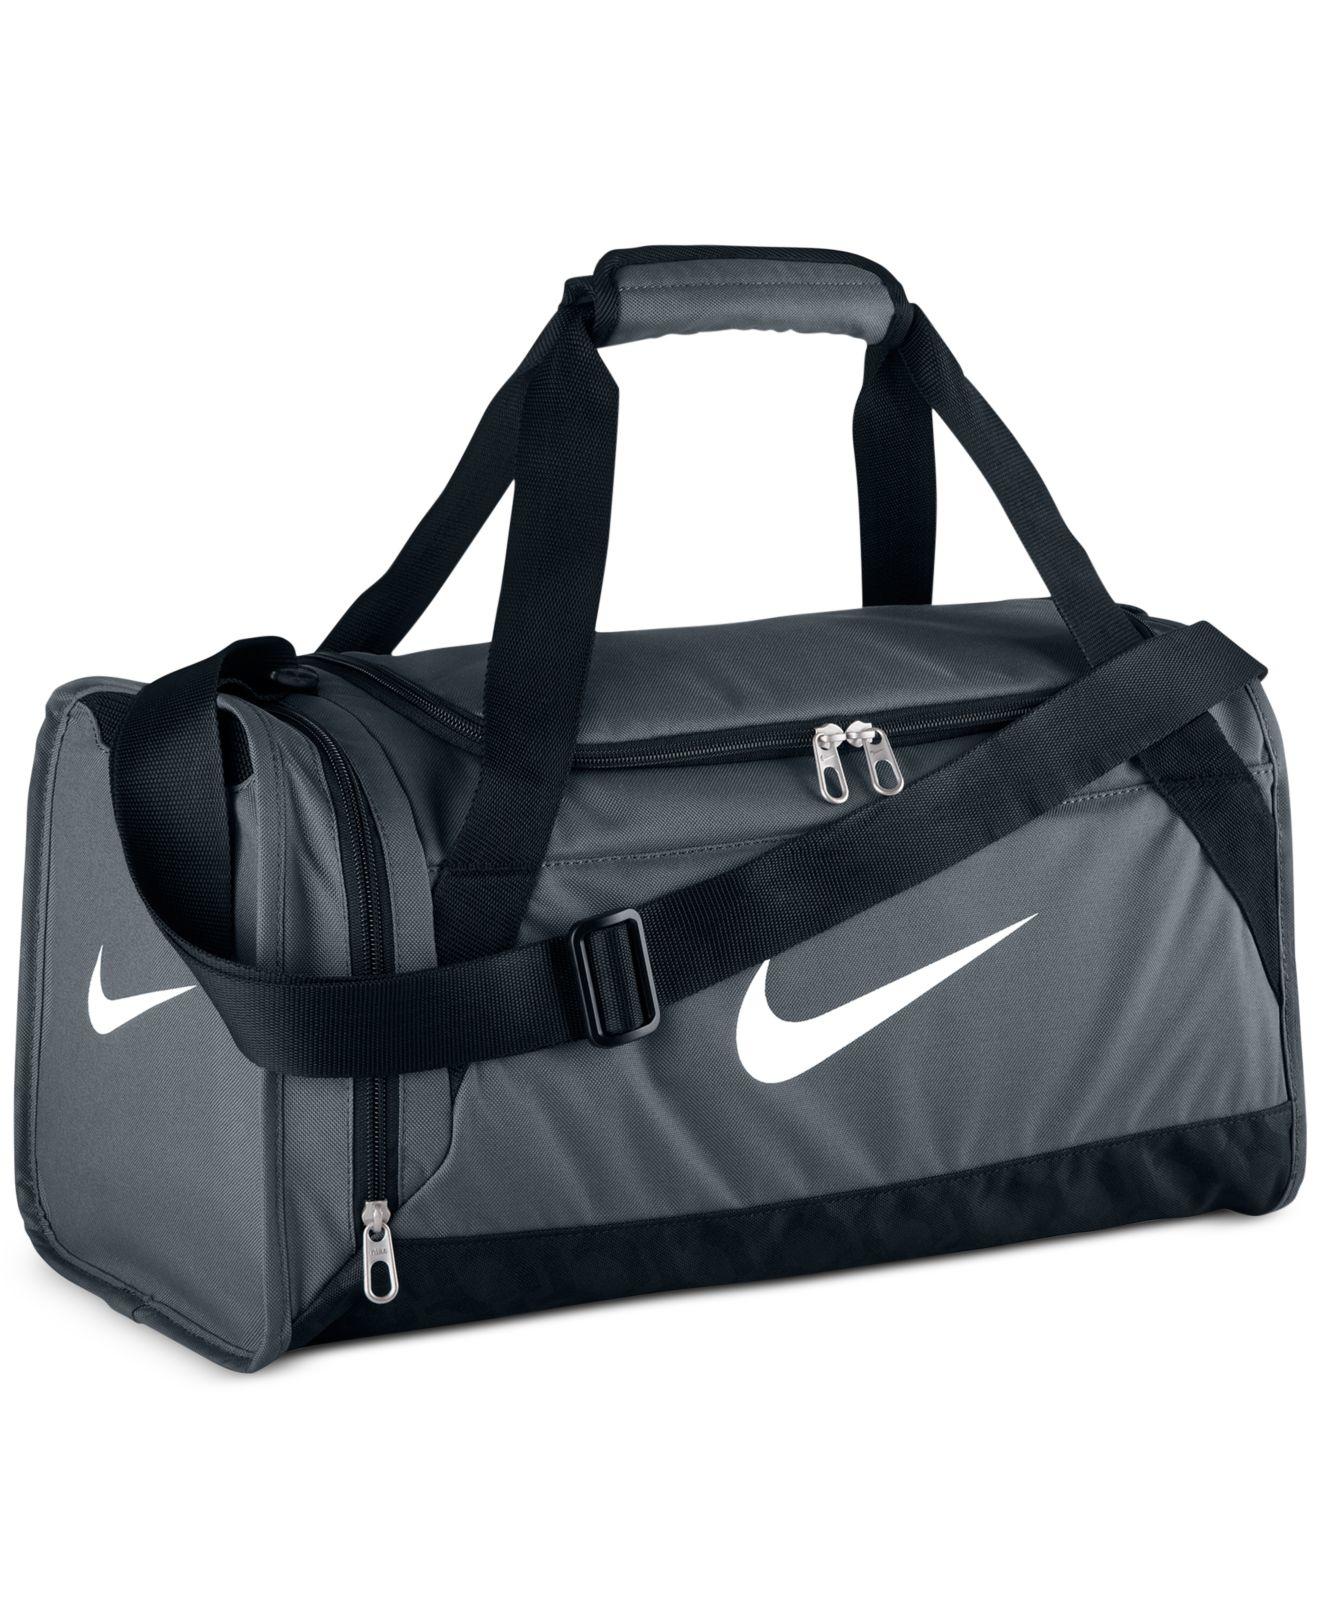 Lyst - Nike Brasilia 6 Extra-Small Duffle Bag in Gray for Men b2c4860219